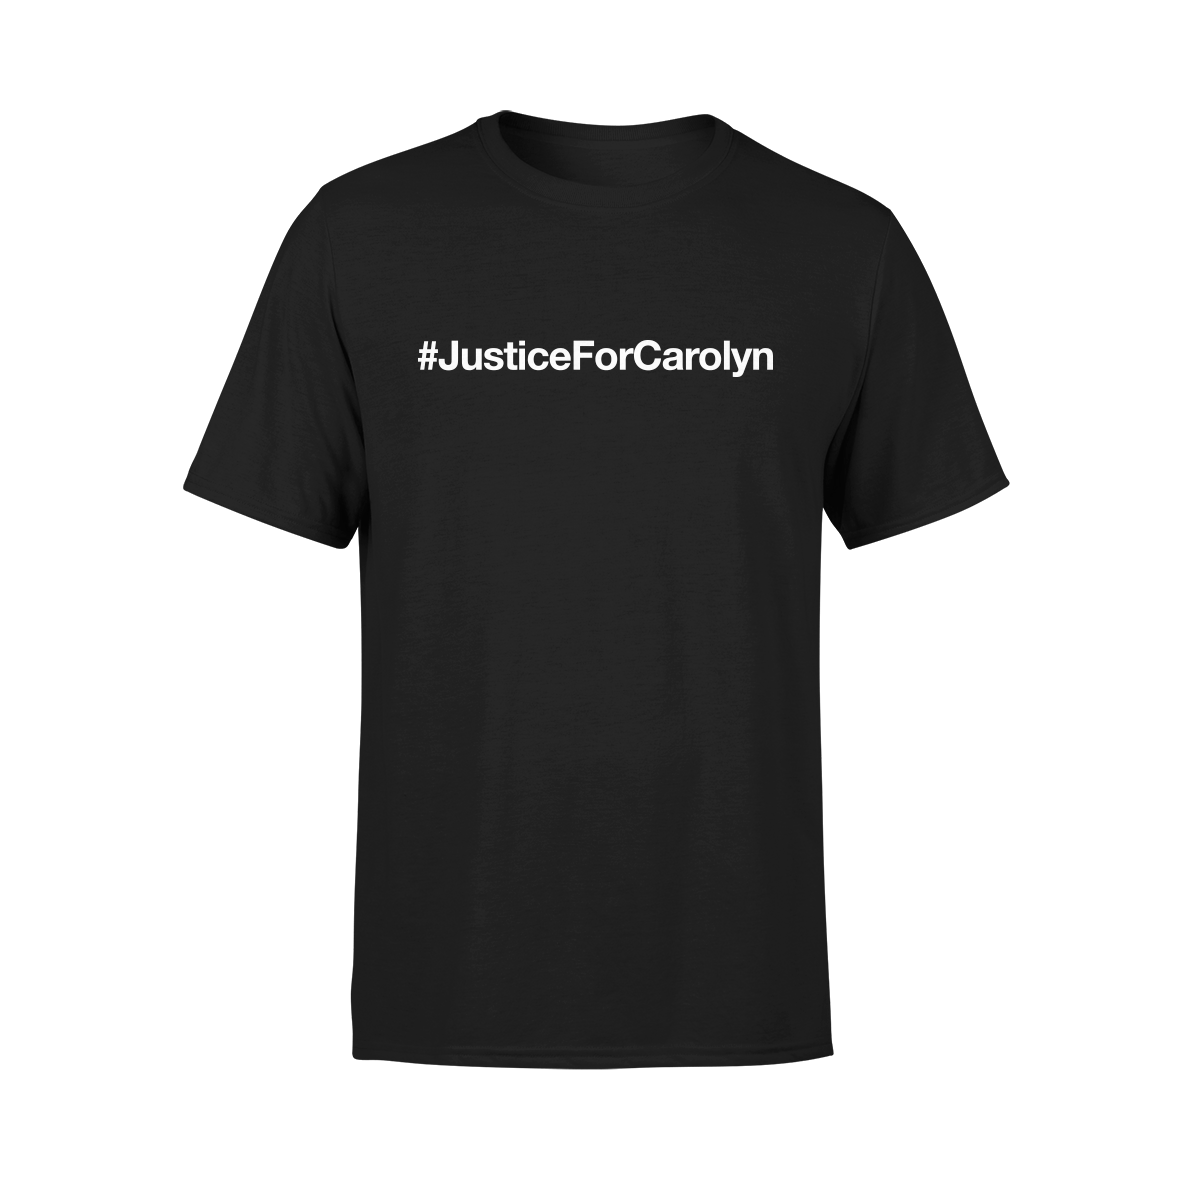 #JusticeForCarolyn T-Shirt - Black